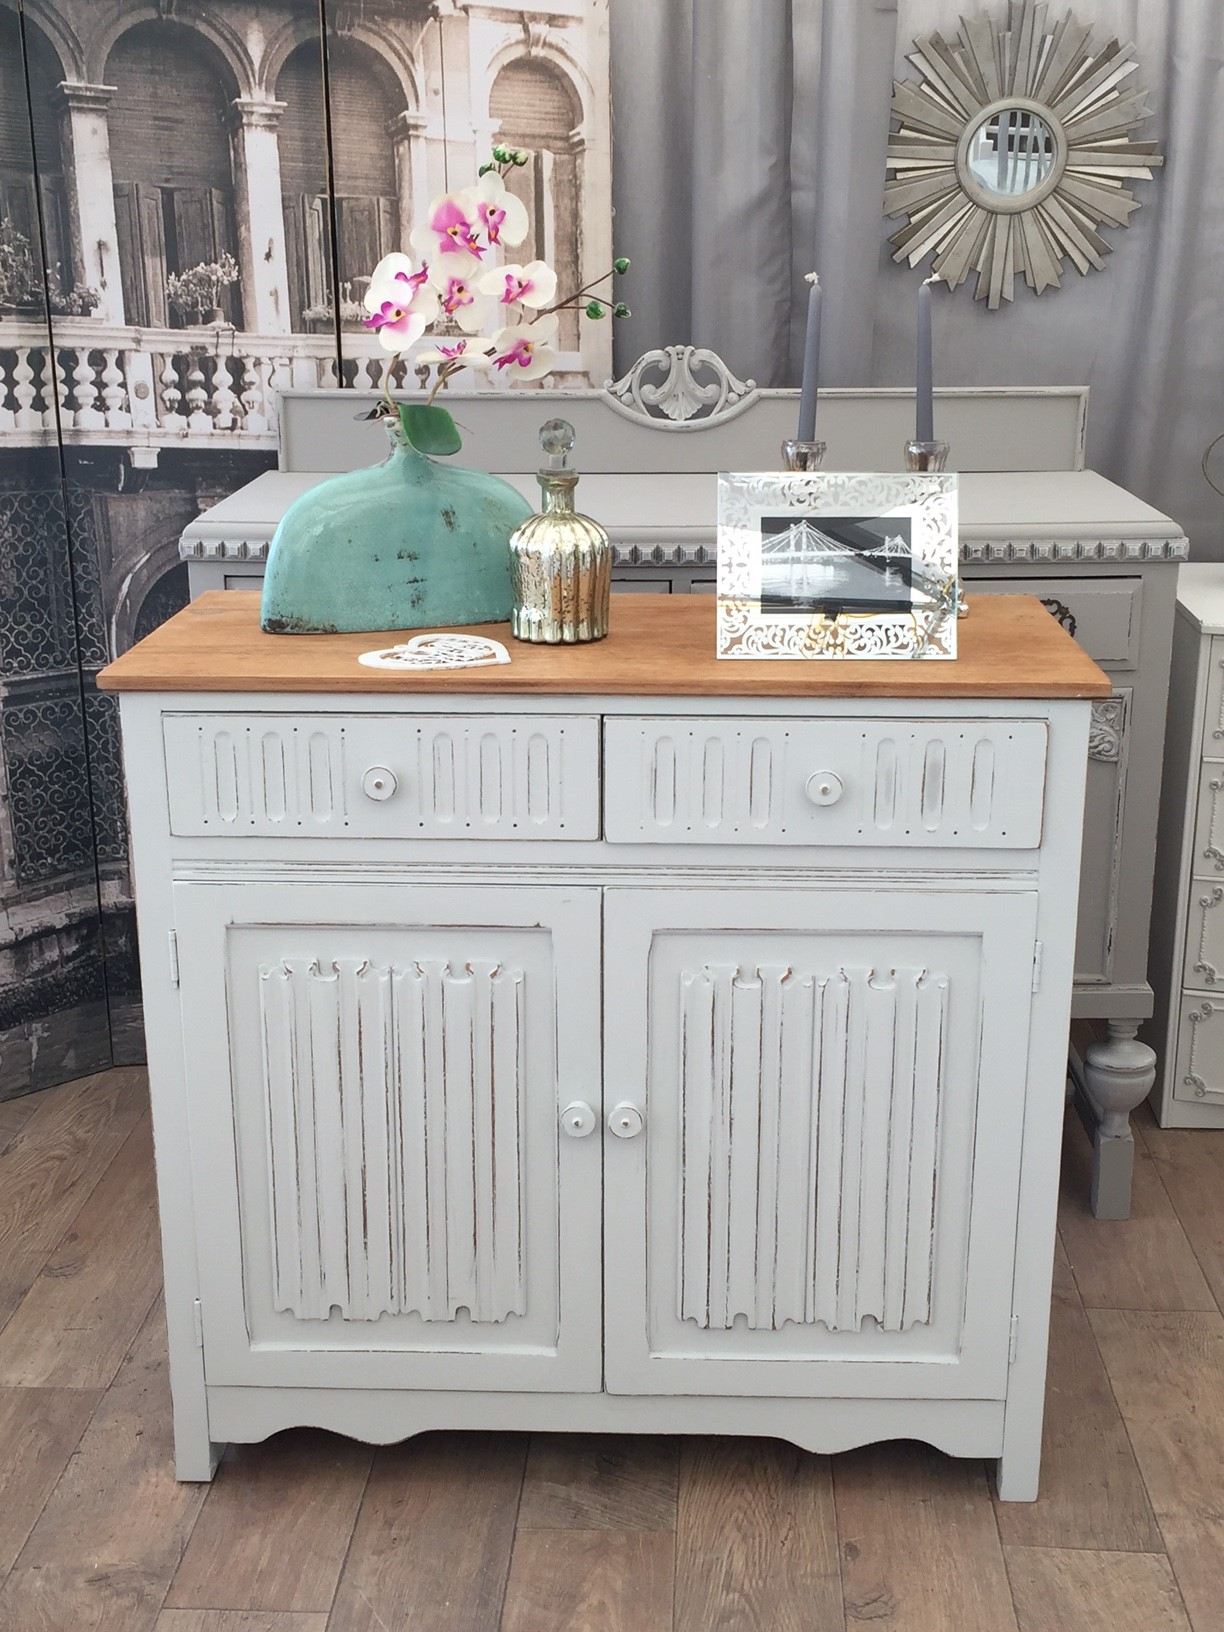 Shabby chic oak cabinet - ECLECTIVO London | Furniture ...